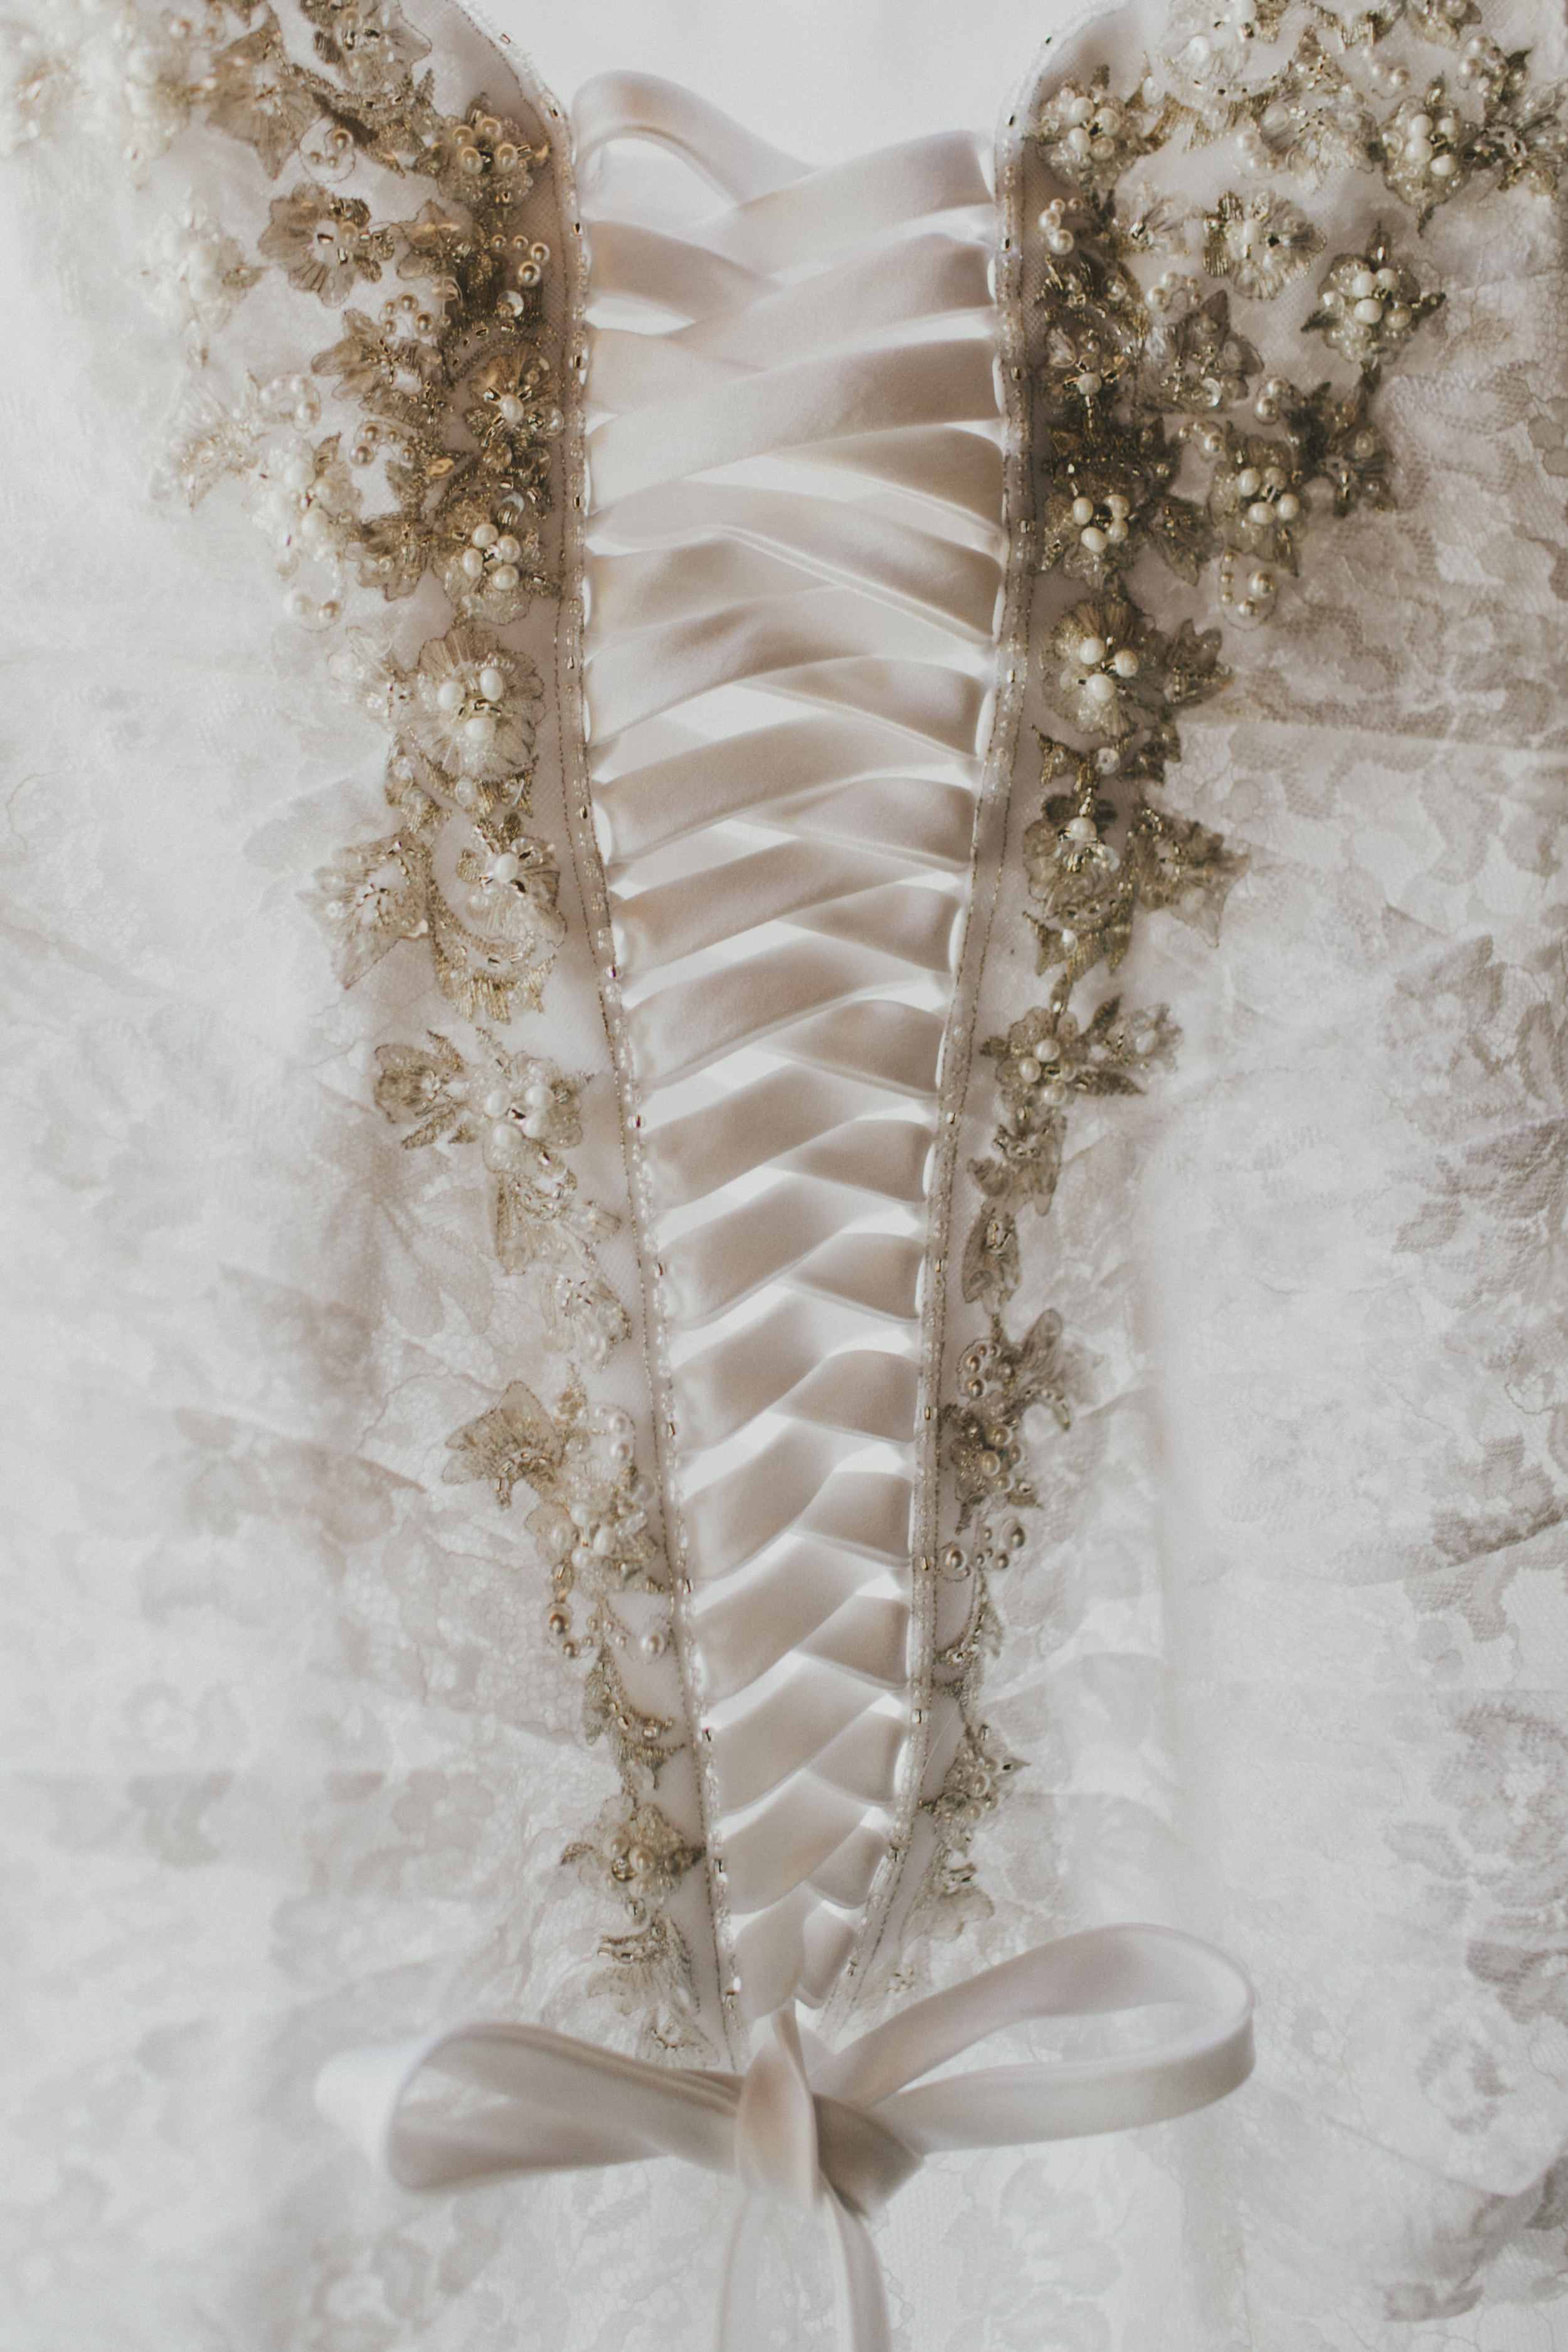 Cheyenne + Jordan - Wedding, Natalie Griffo (6 of 157).jpg